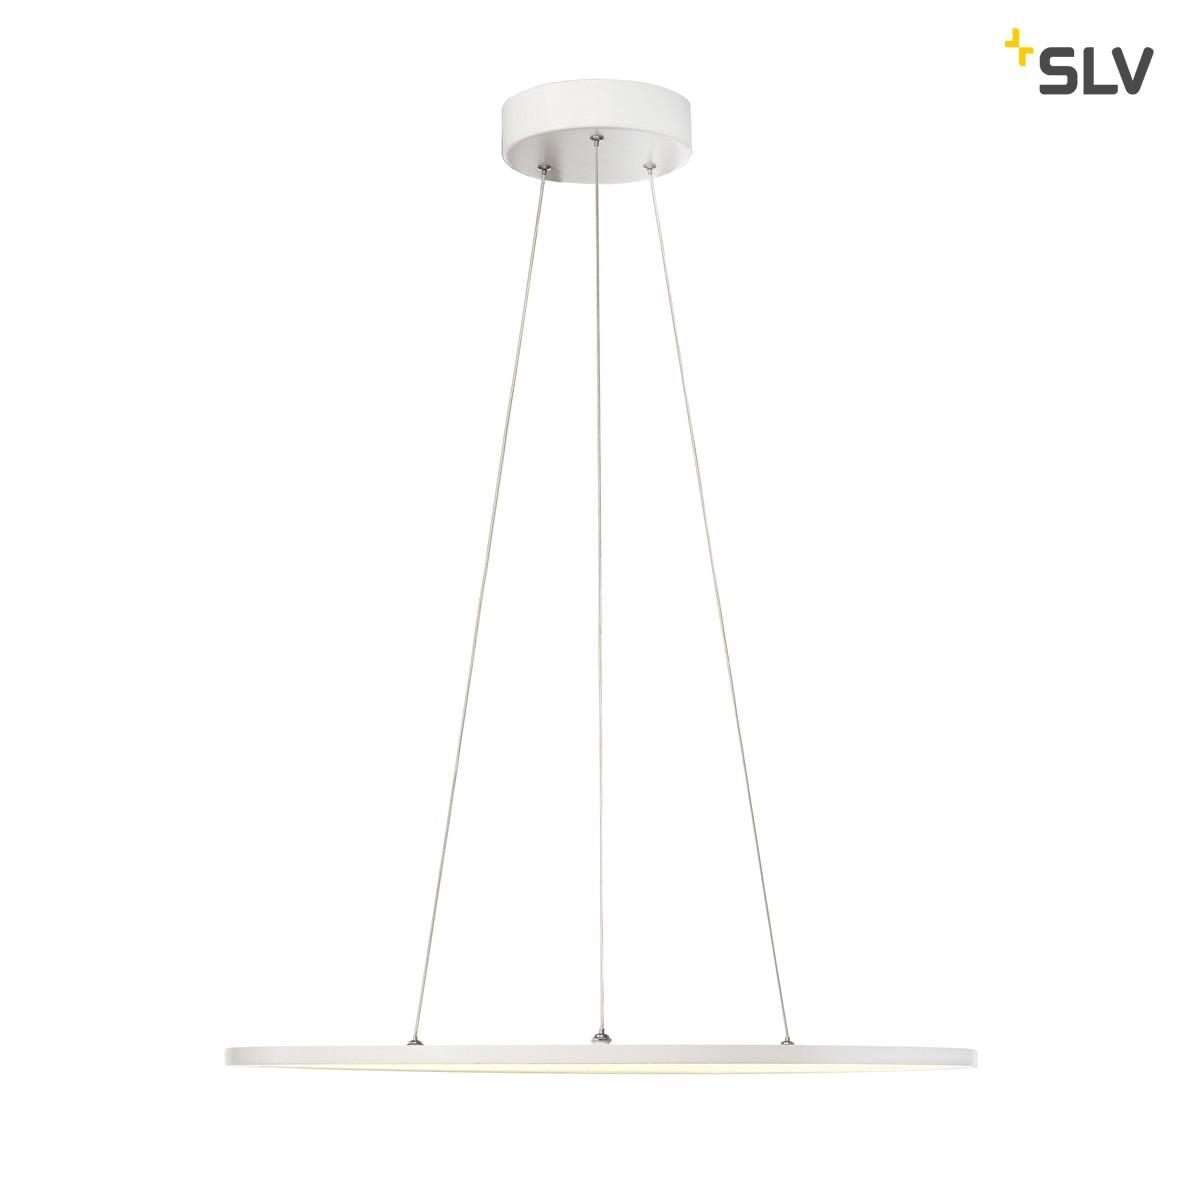 SLV LED Panel Pendelleuchte, 3000°K, weiß